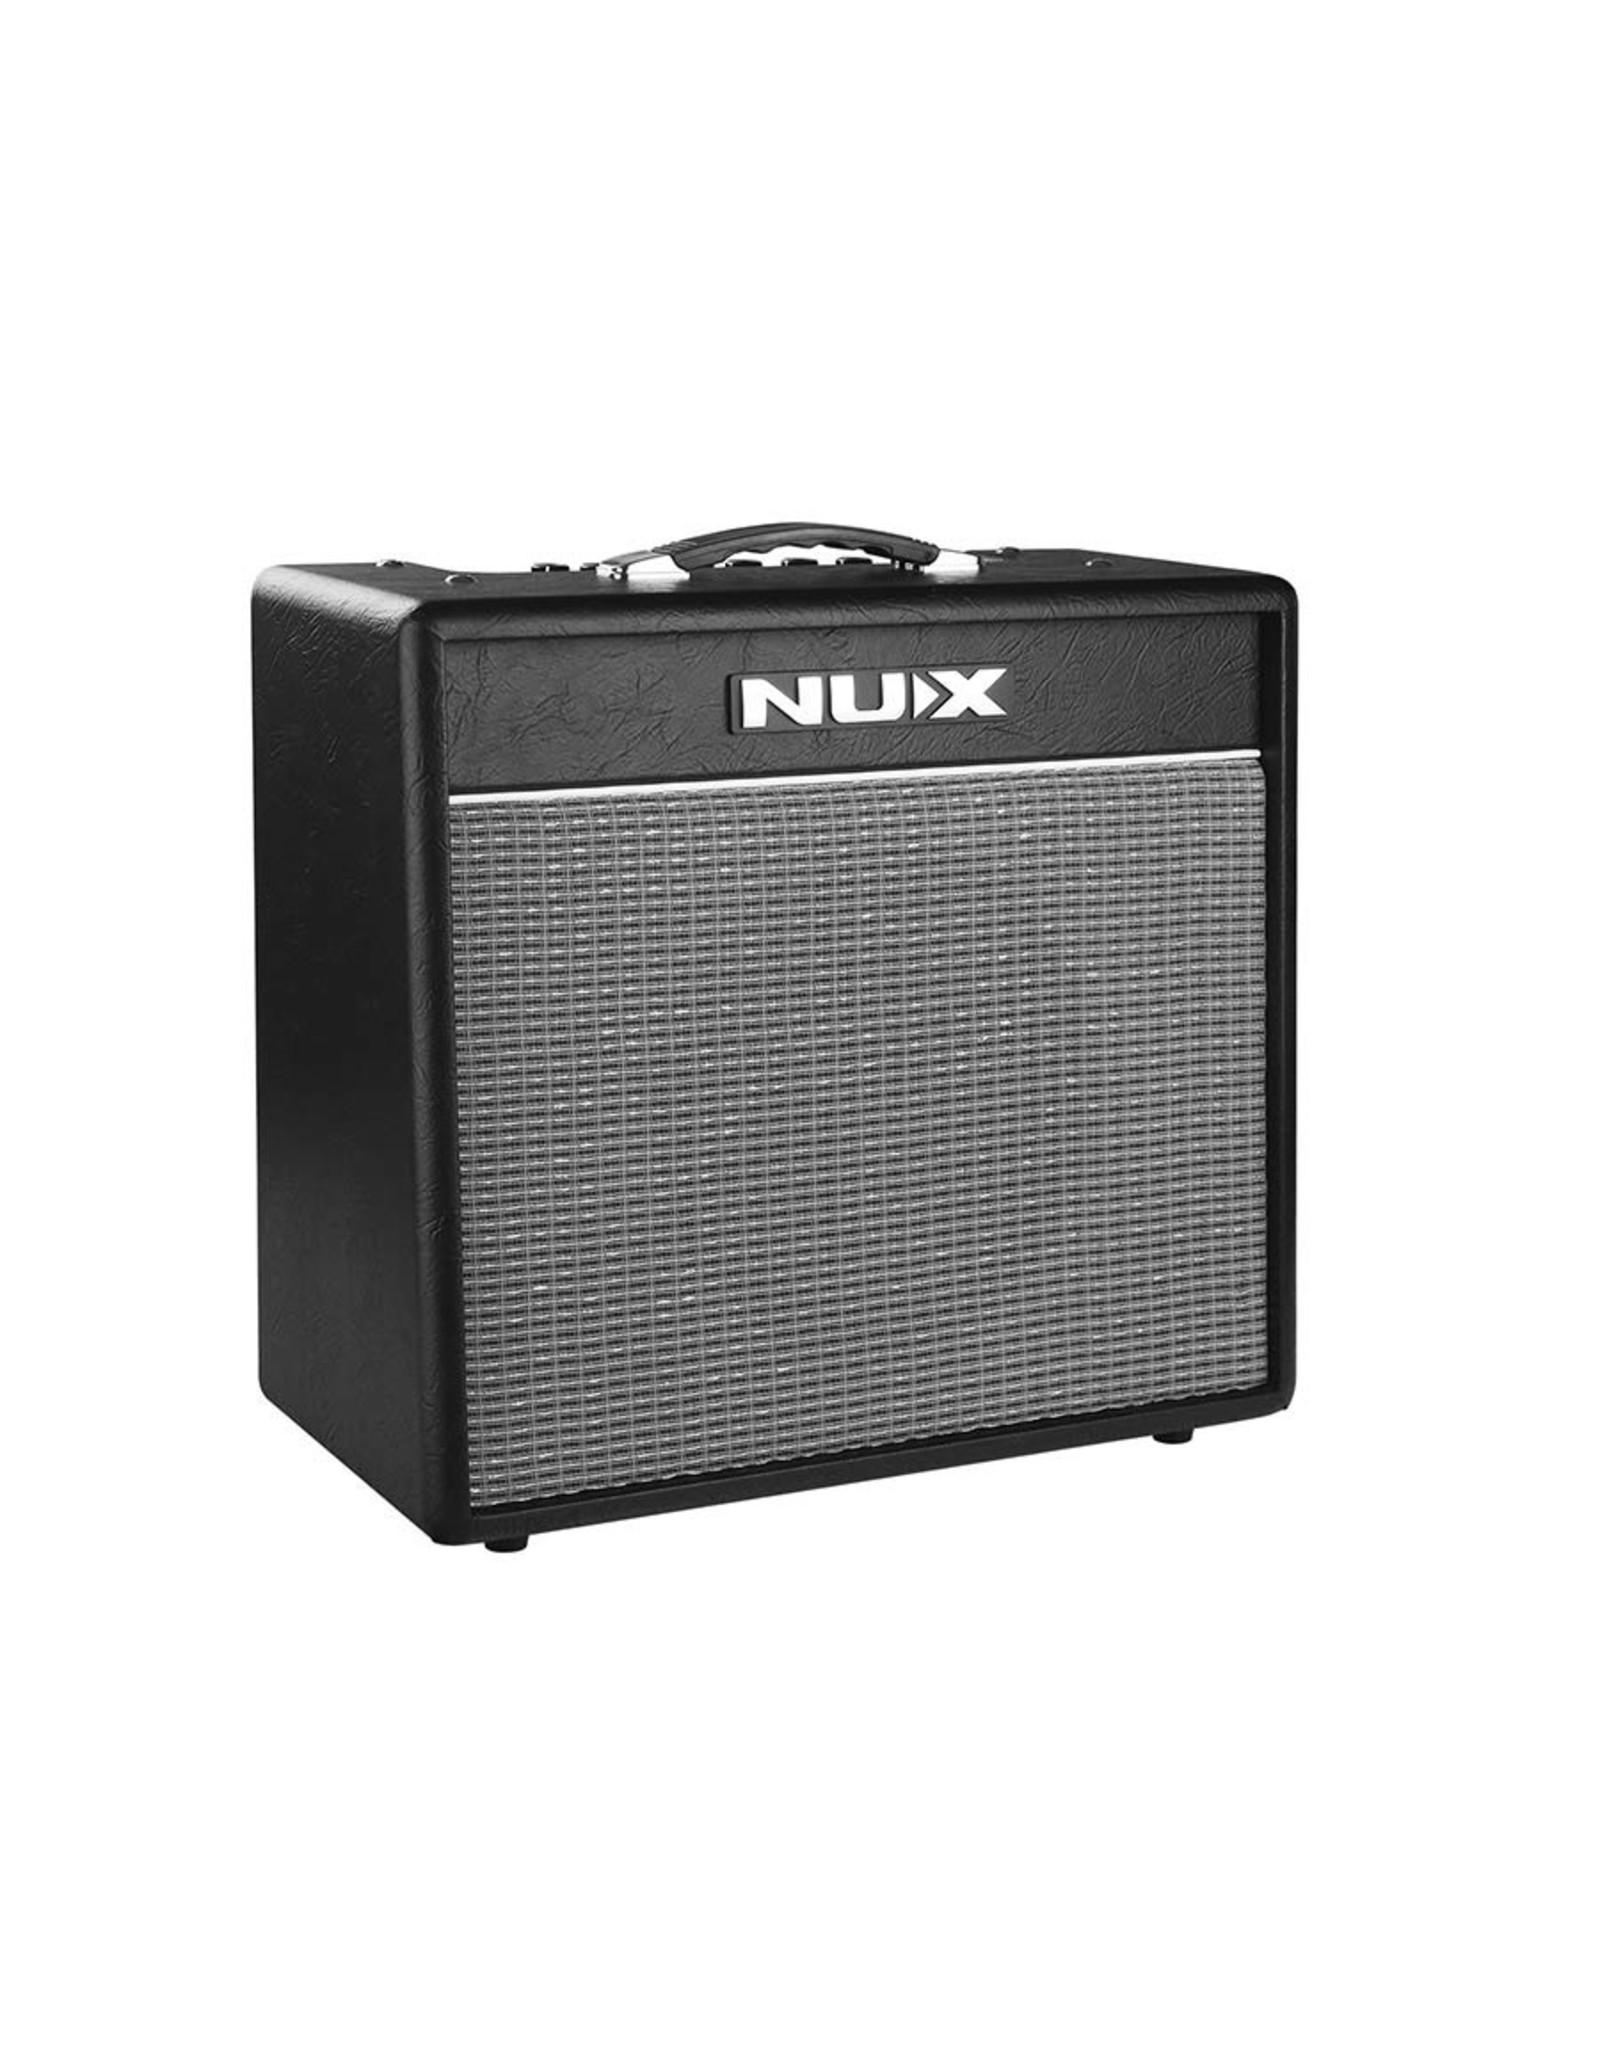 NUX Nux Mighty 40 BT